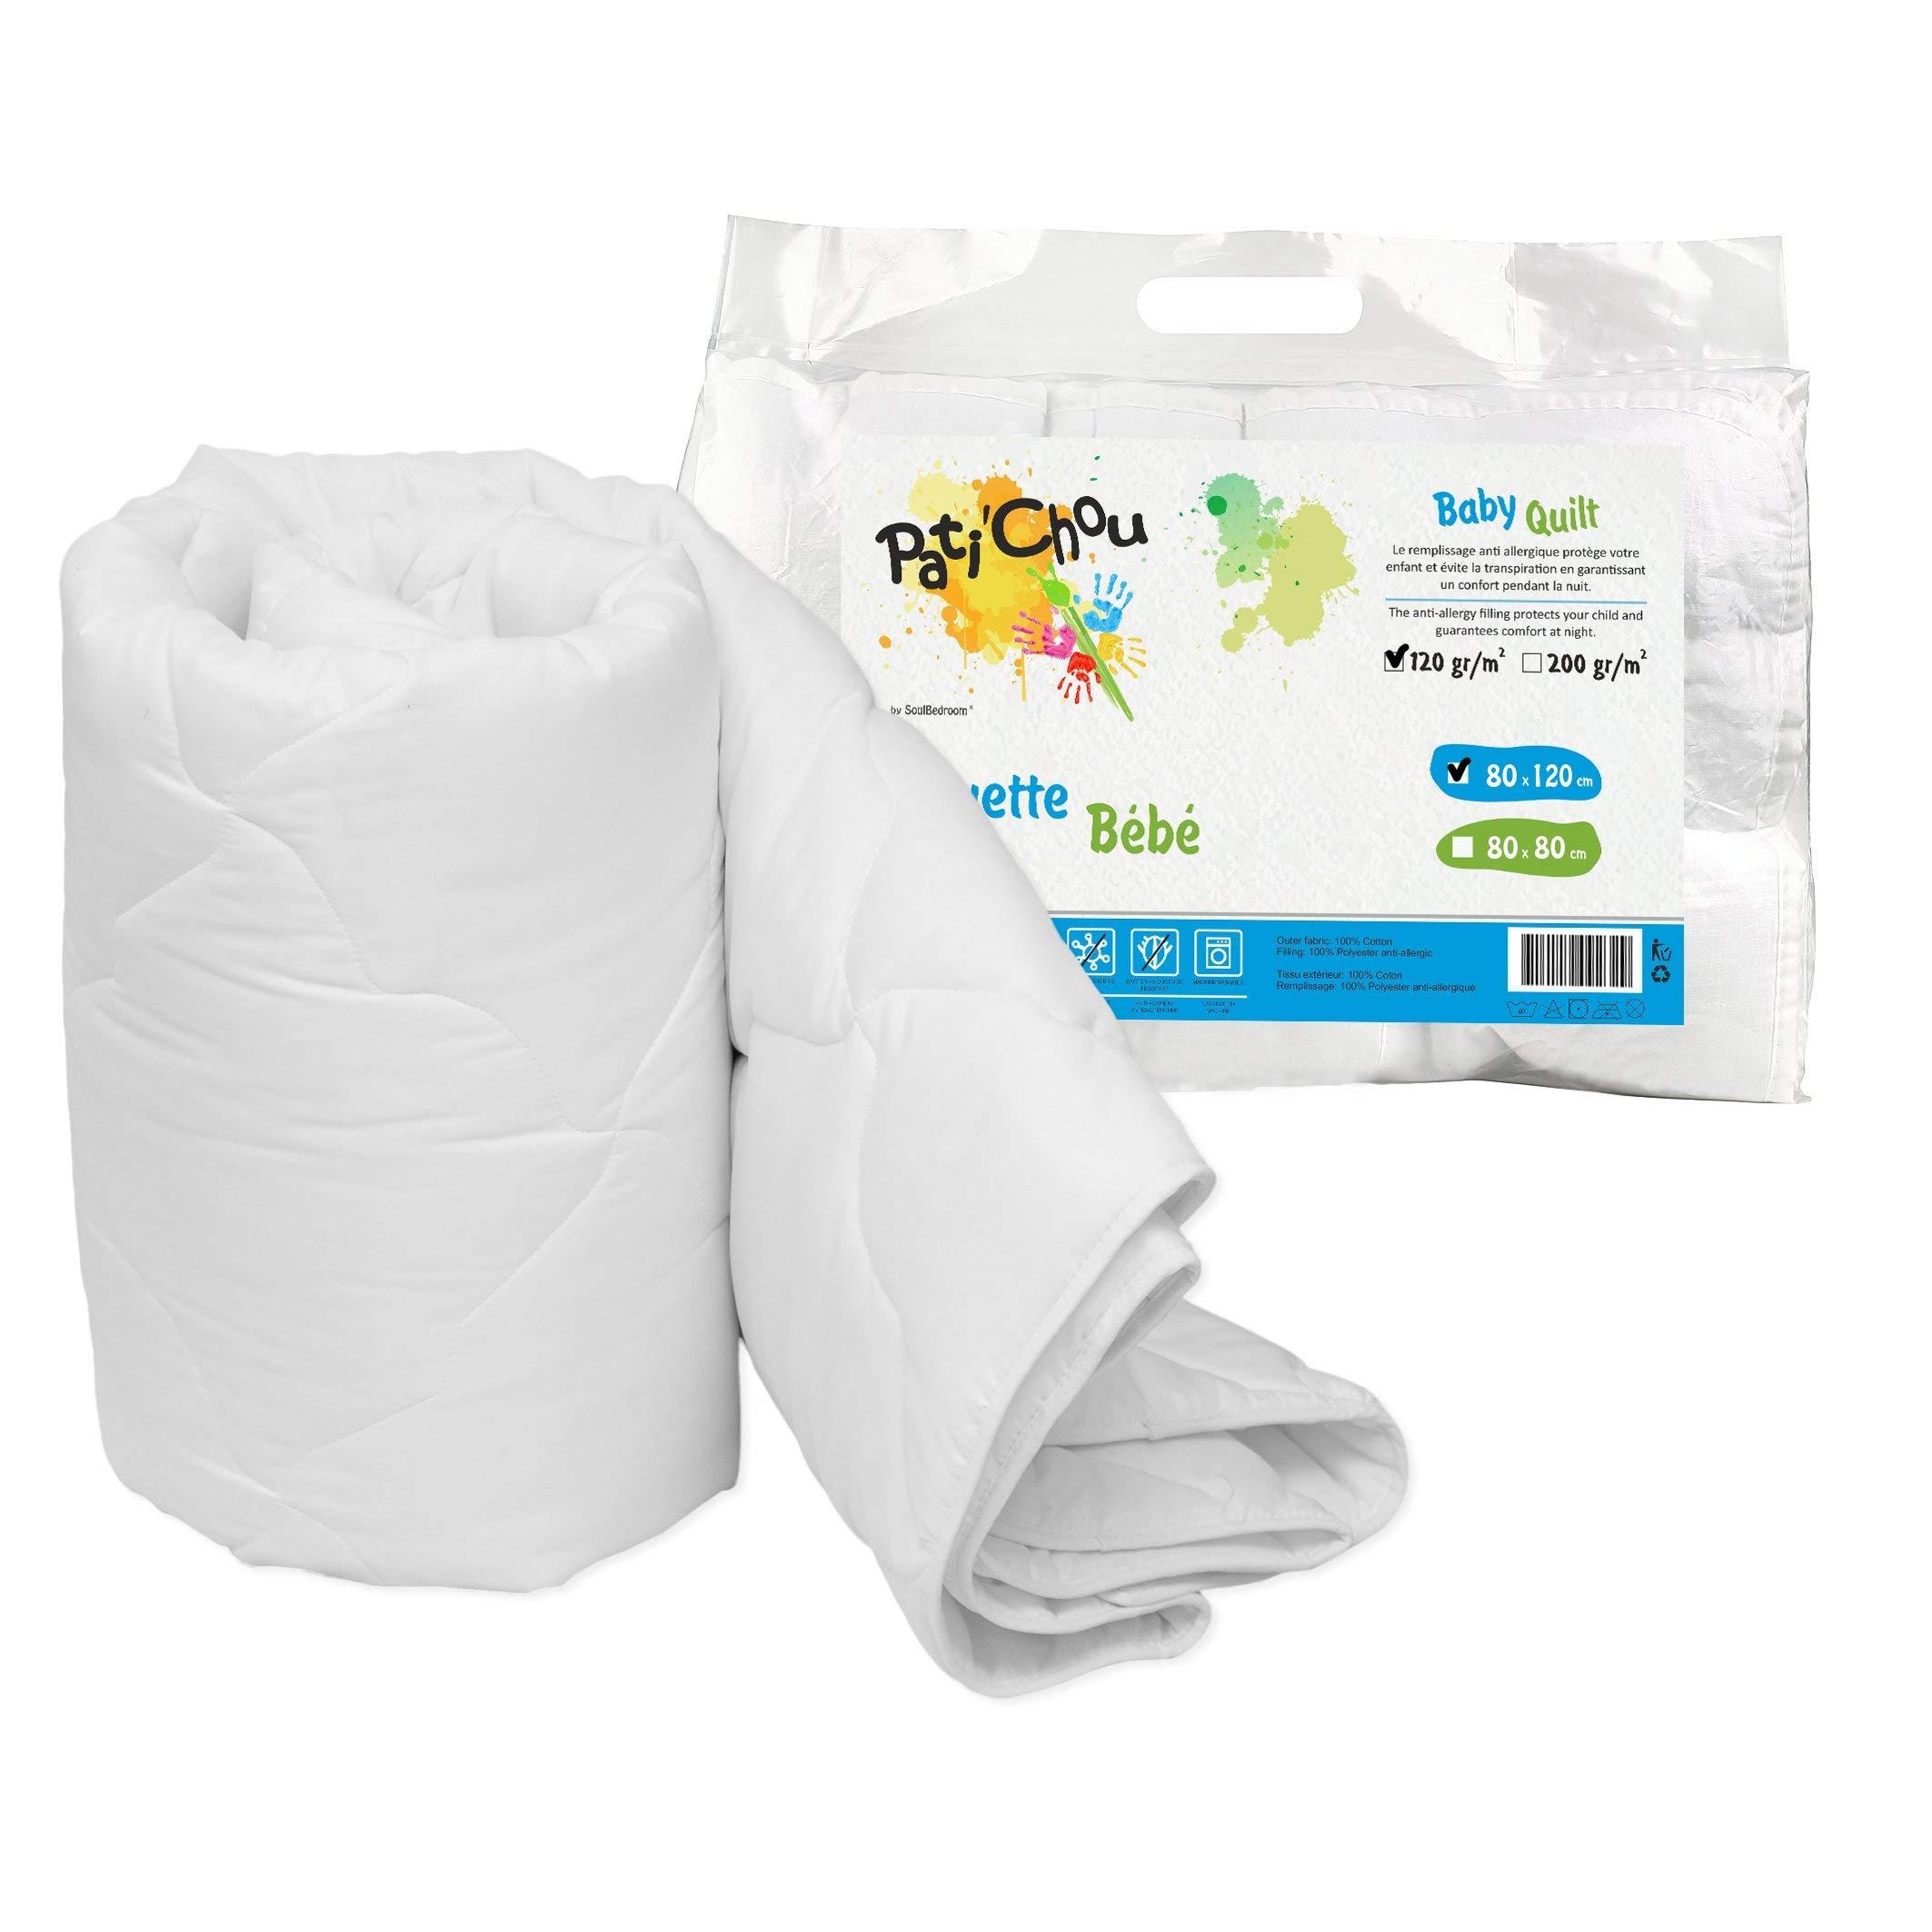 Pati'Chou 31''x 47'' Kids Baby Light Quilt Duvet (100% Cotton Cover, tog 2.5) 80x120 cm